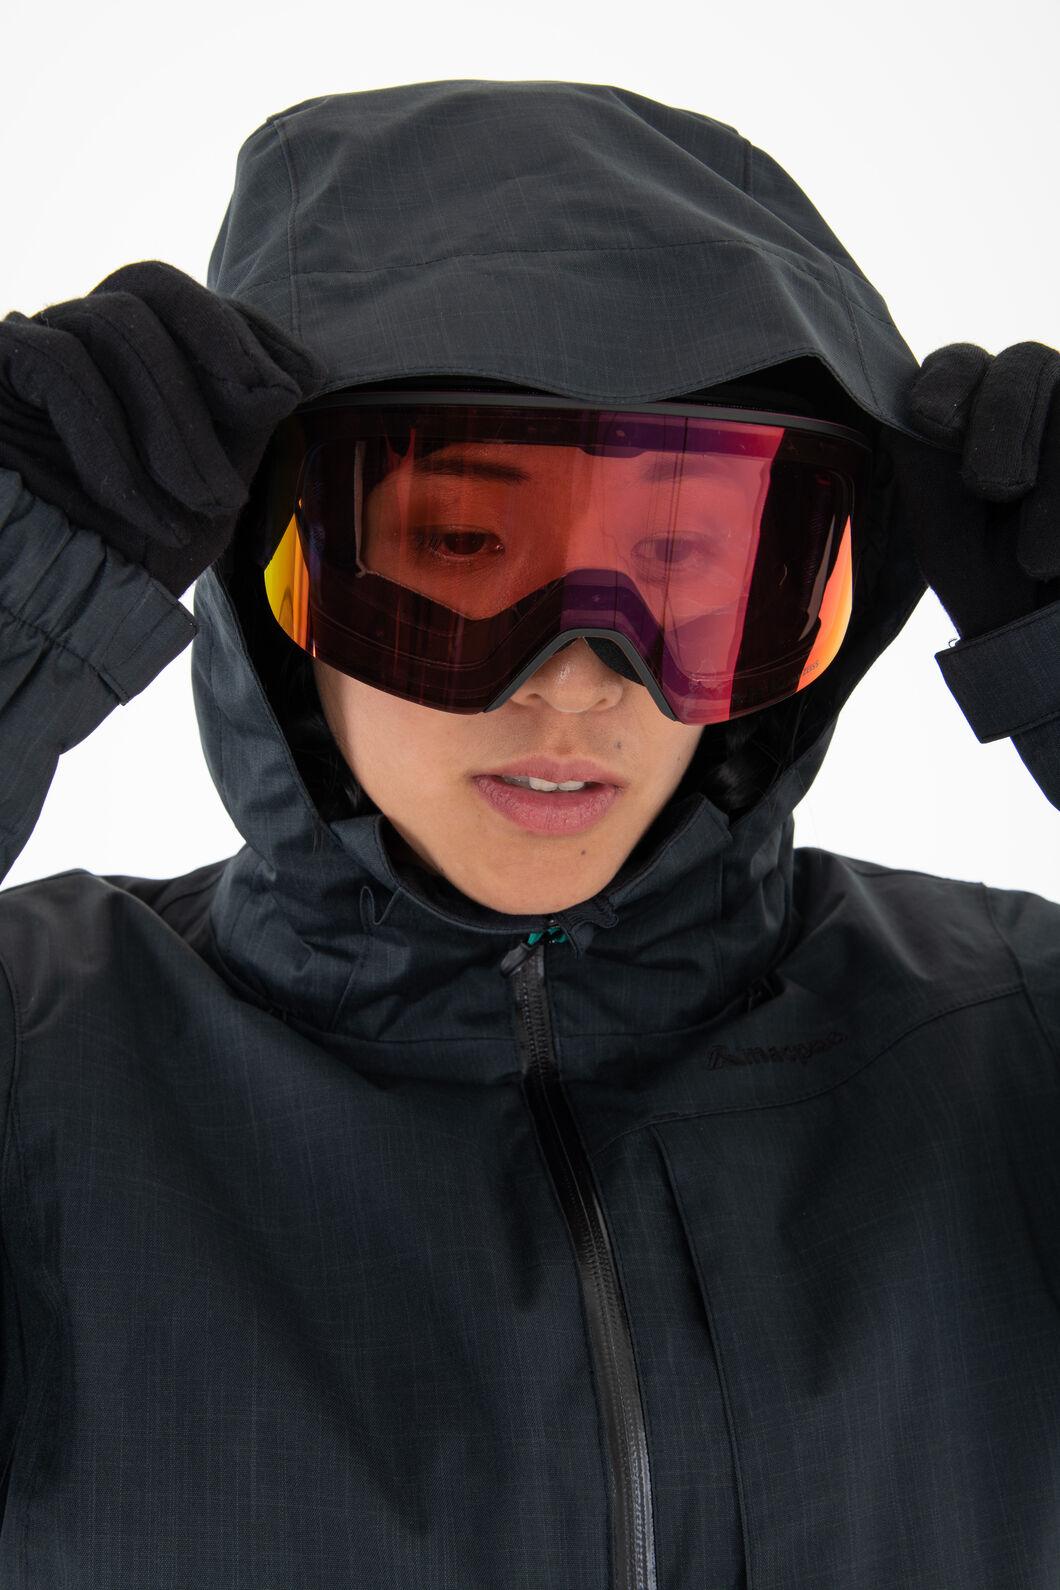 Macpac Powder Reflex™ Ski Jacket — Women's, Black/Black, hi-res